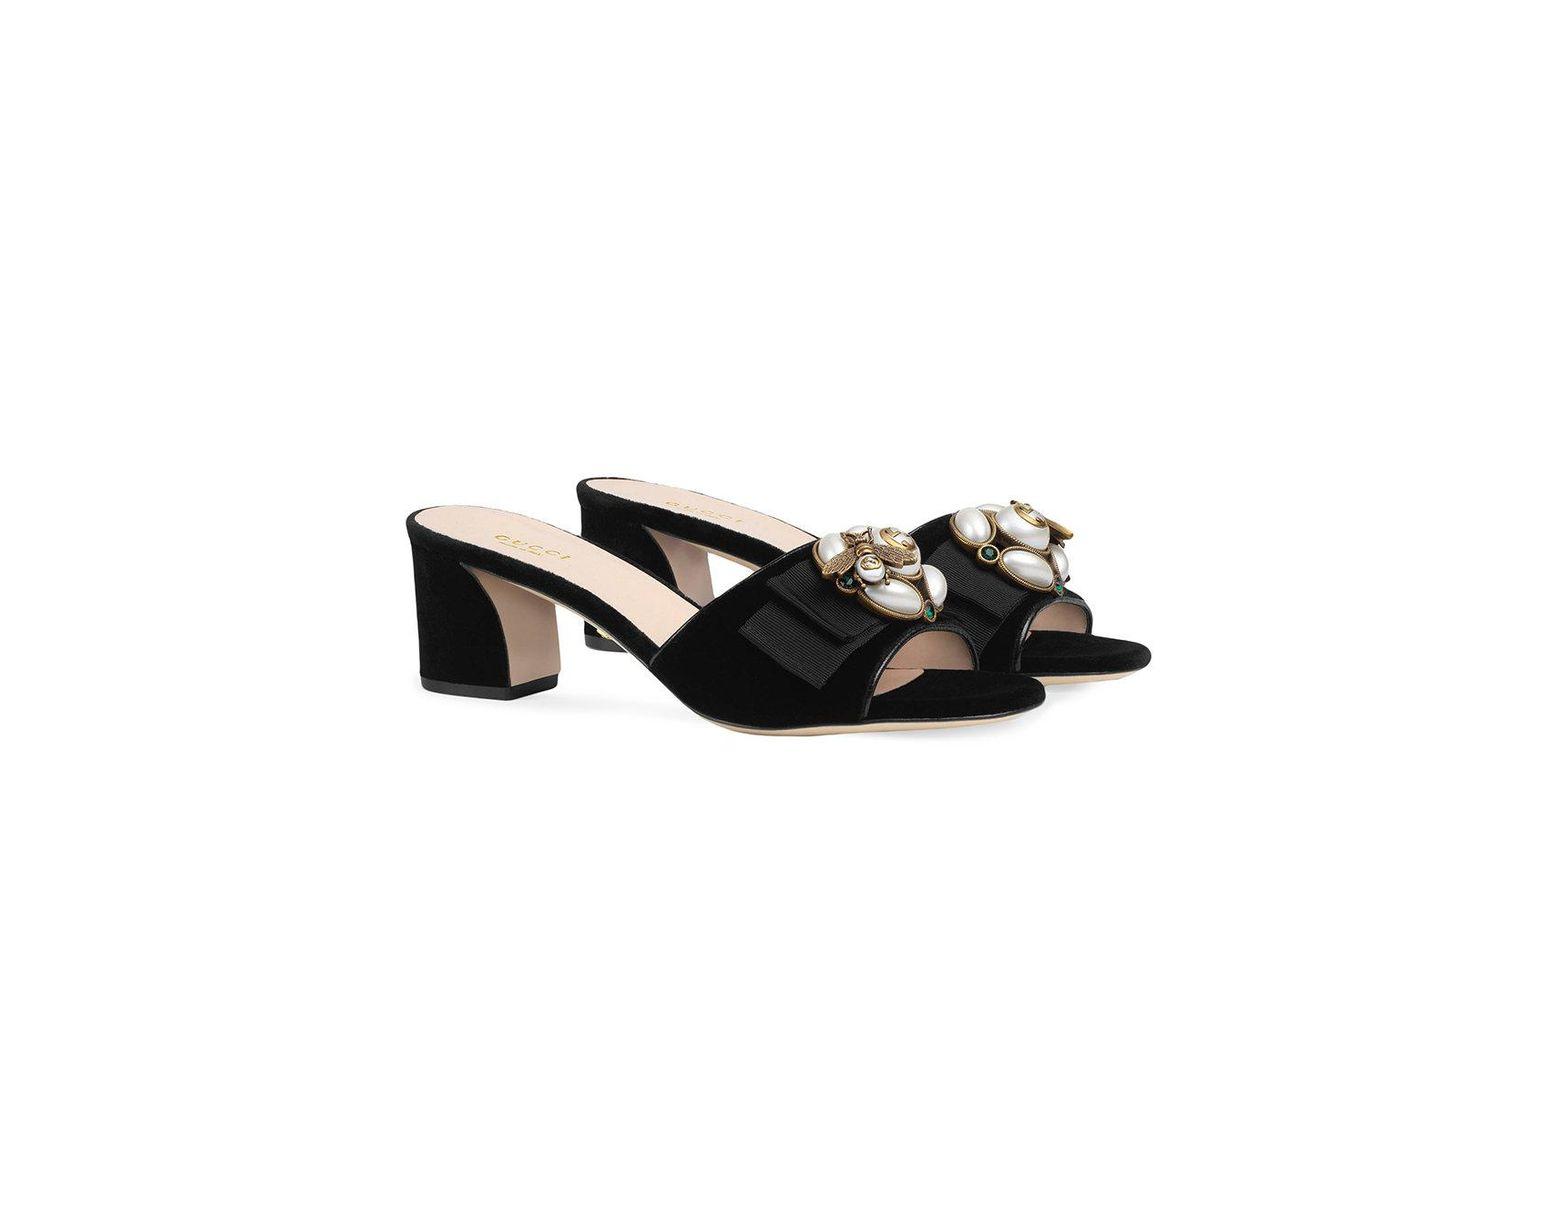 77cd40189 Gucci Velvet Mid-heel Slide With Bee in Black - Lyst